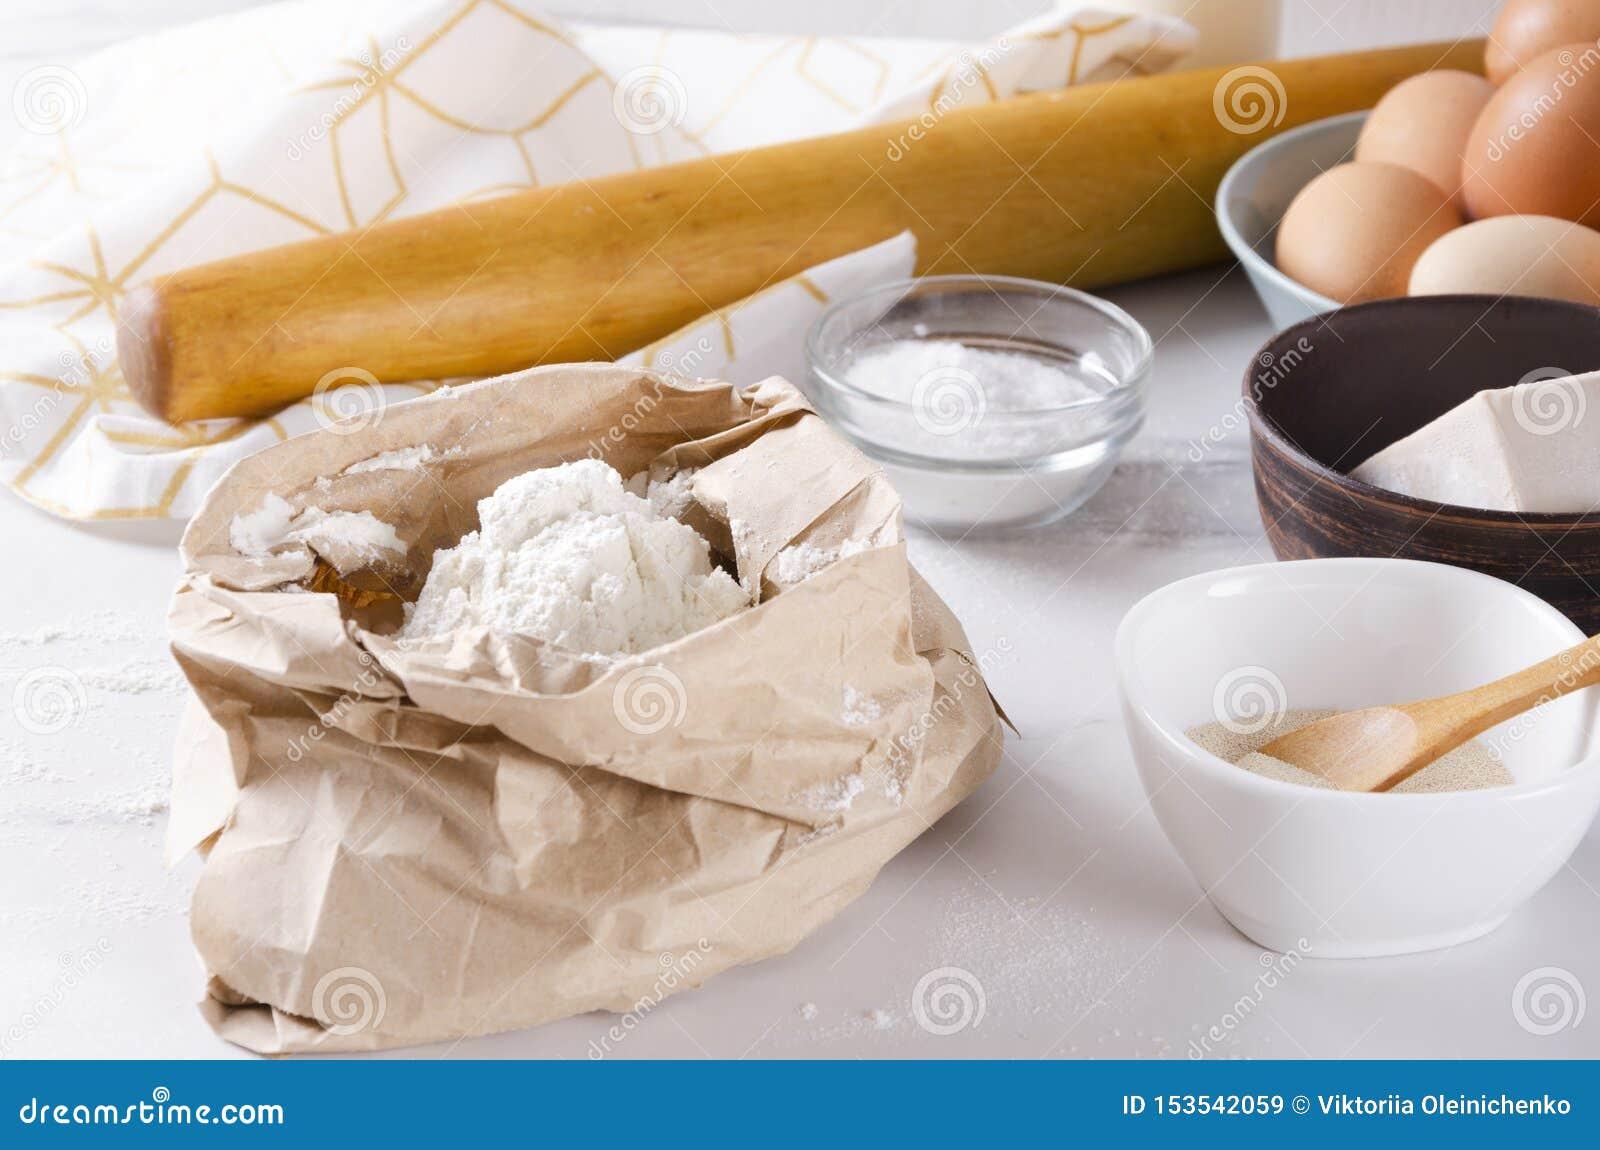 Заполнение бумажного мешка муки, яя, соли, дрожжей, вращающей оси, полотенца кухни на белой таблице Процесс подготовки теста